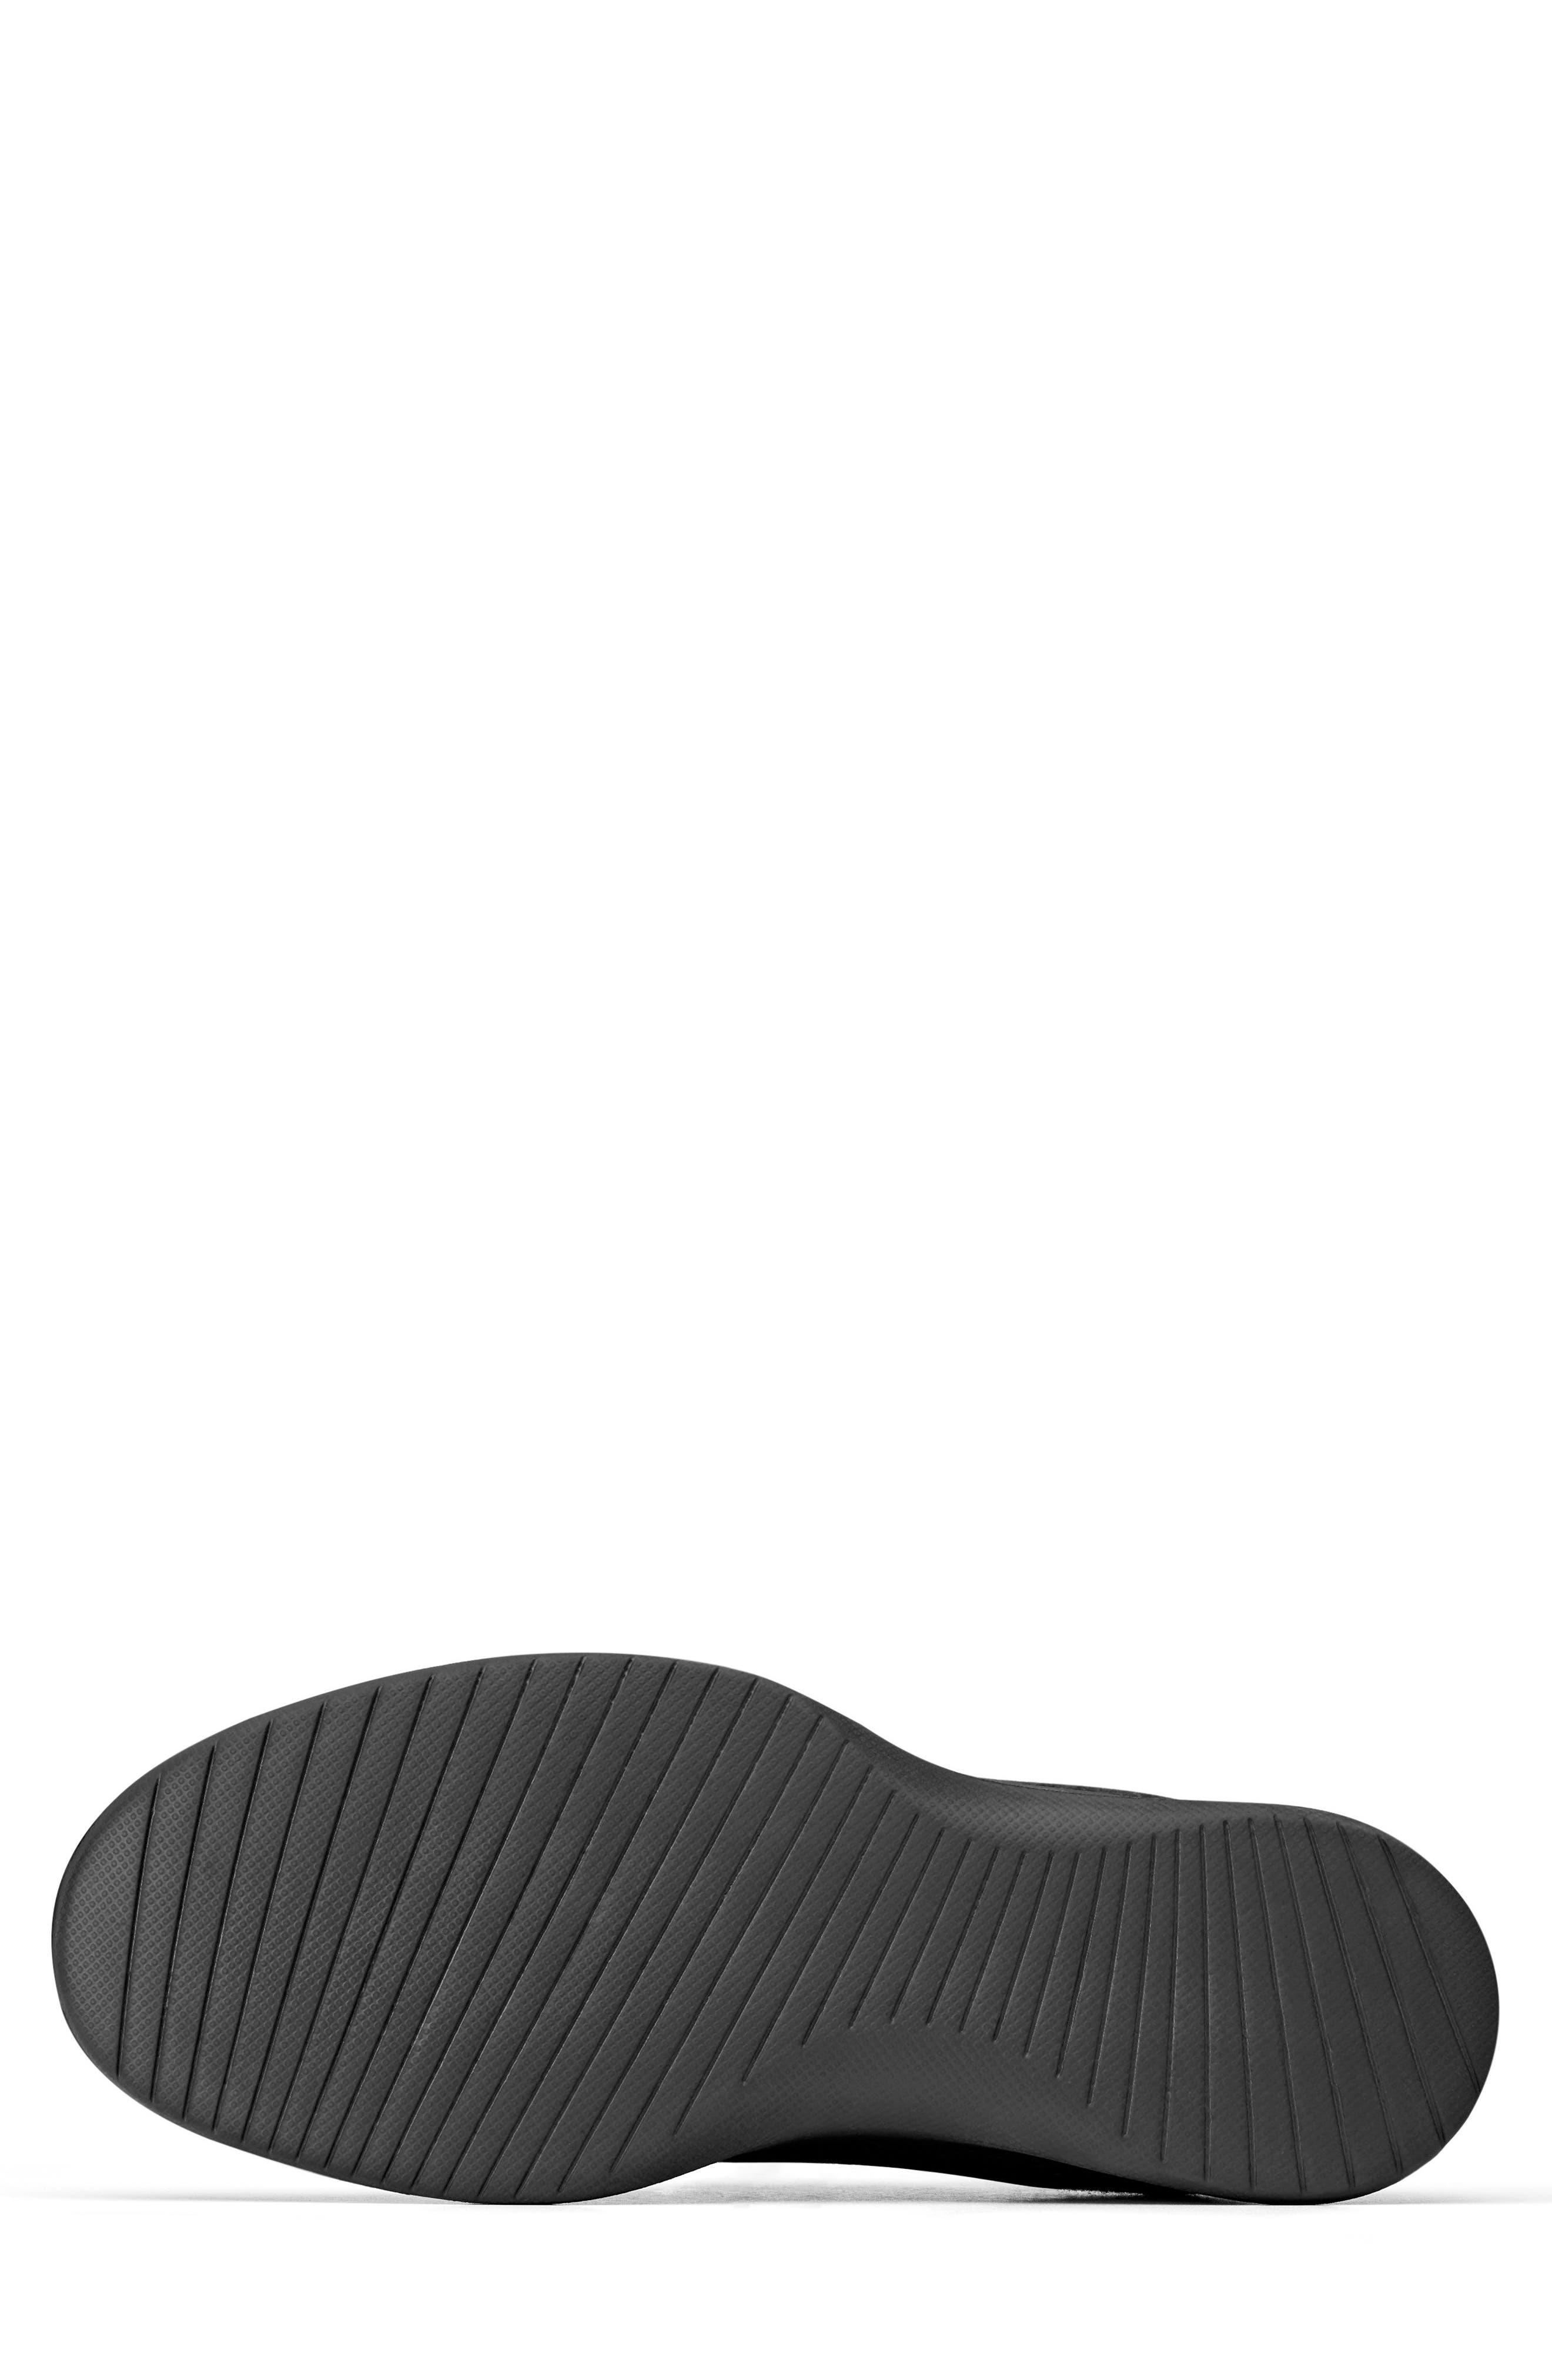 Wool Runner,                             Alternate thumbnail 5, color,                             Natural Black